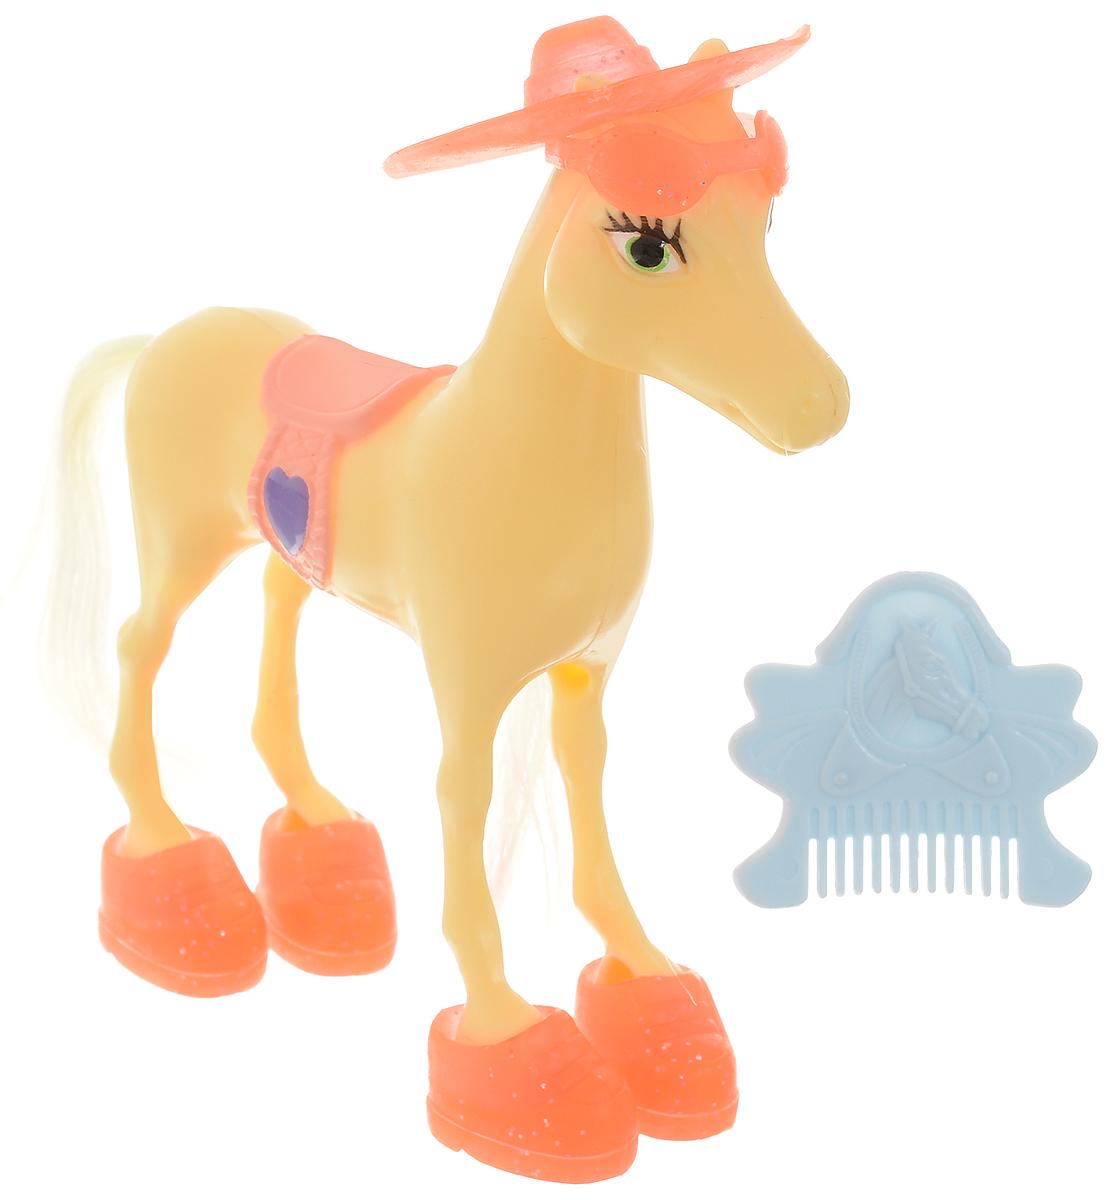 Simba Фигурка Волшебная лошадка цвет желтый набор felicita волшебная лошадка единорог 282480b